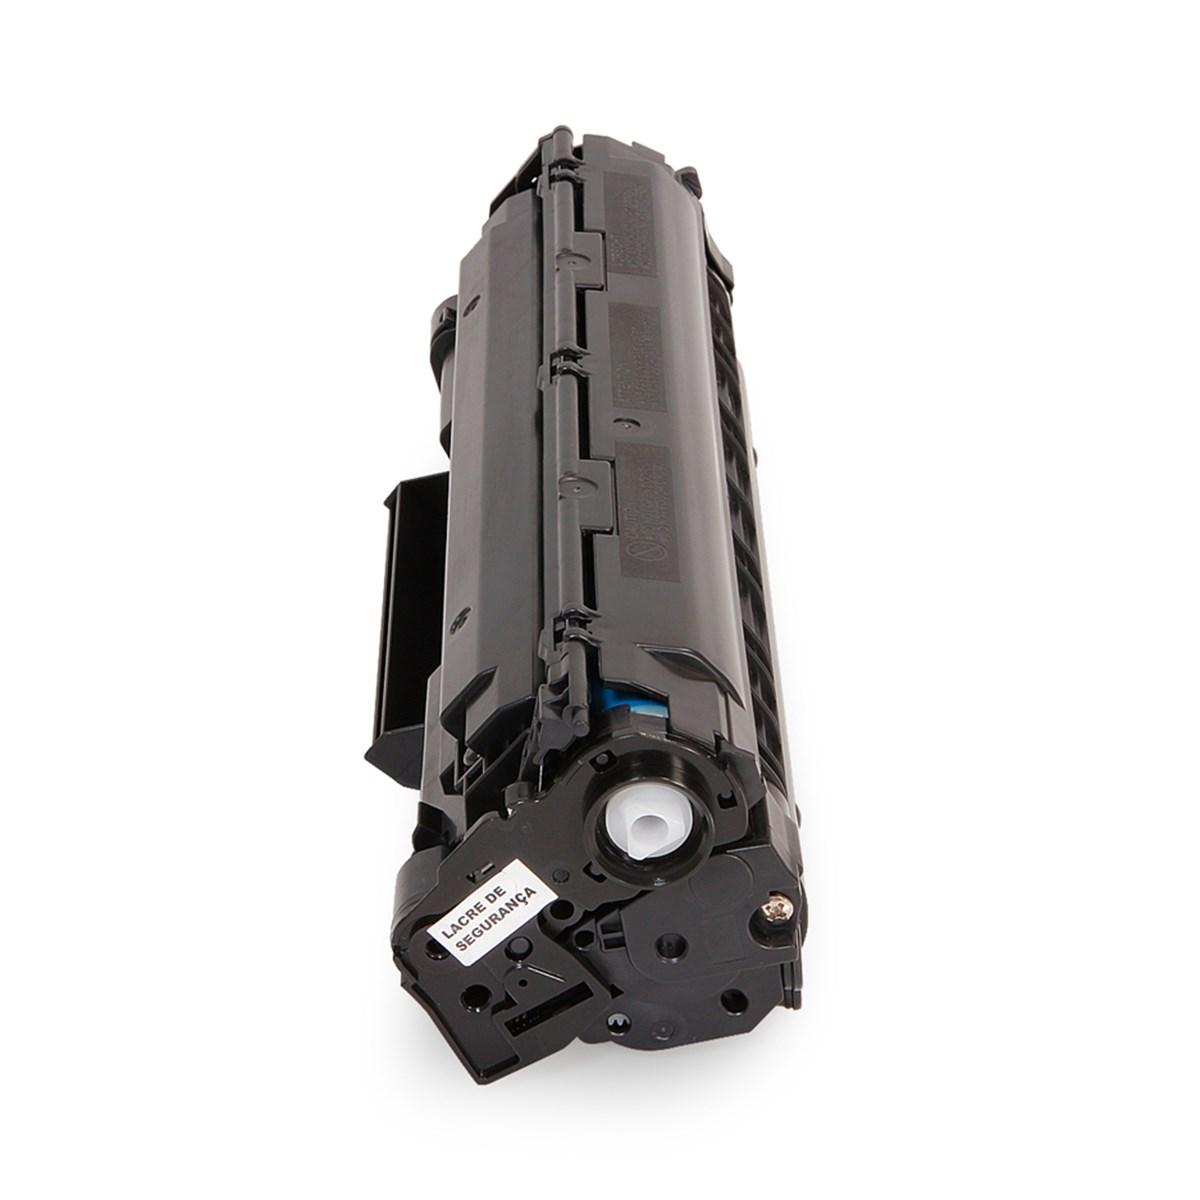 Compativel: Toner Novasupri para CB436A para HP p1505 m1120 m1522 p1505N